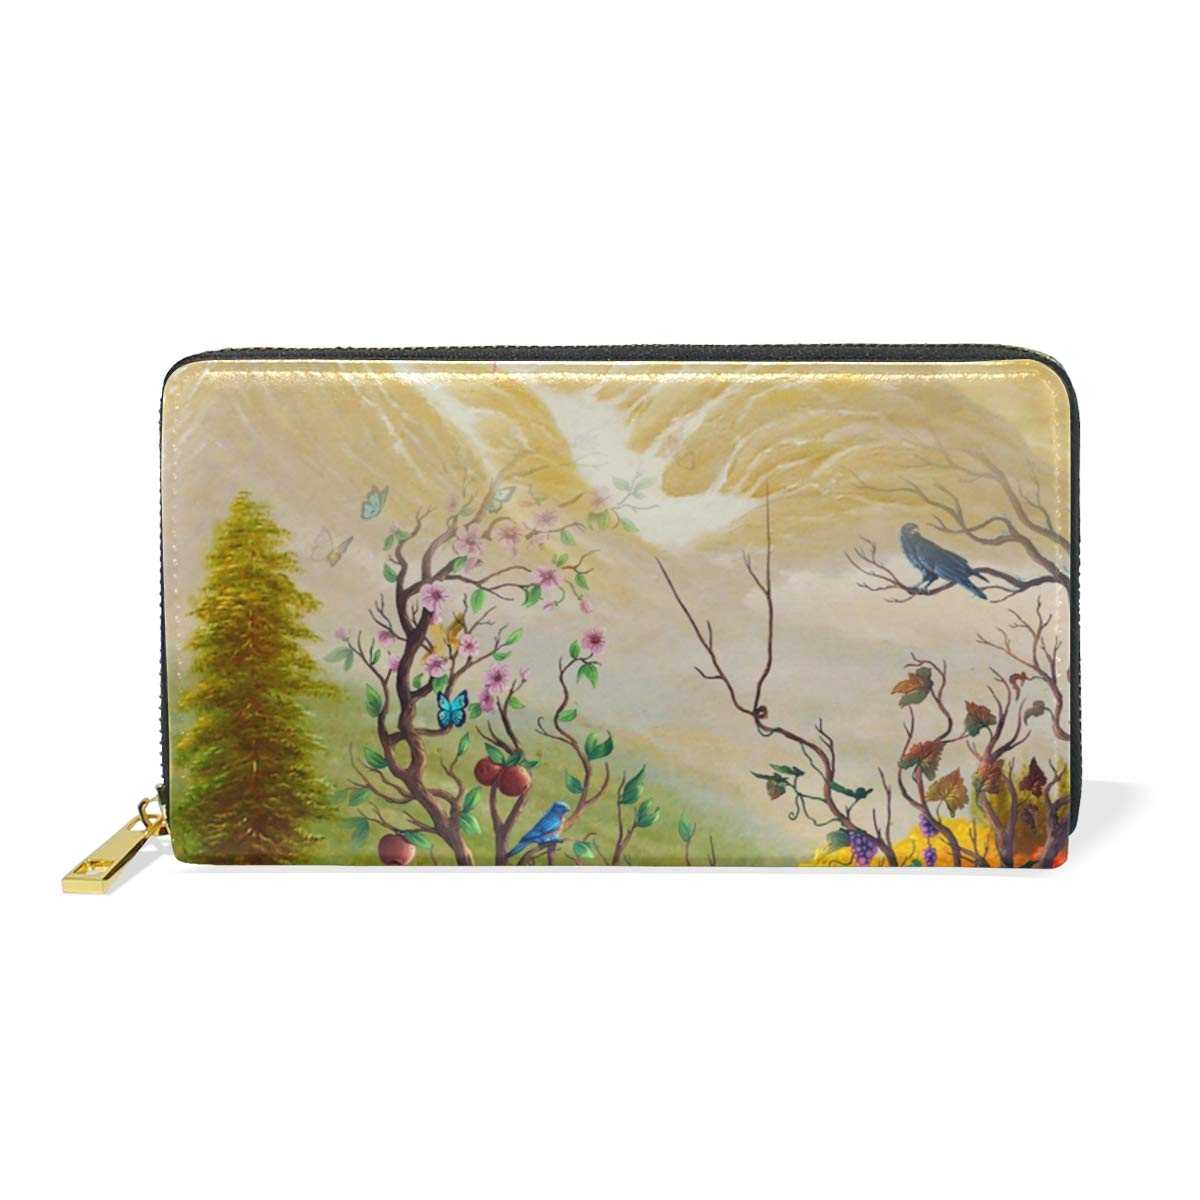 color3 SHANGLONG Fashion Leather Women Illustration Tree Print Wallet Long Clutch Zipper Purse for Girl Card Holder Handbag